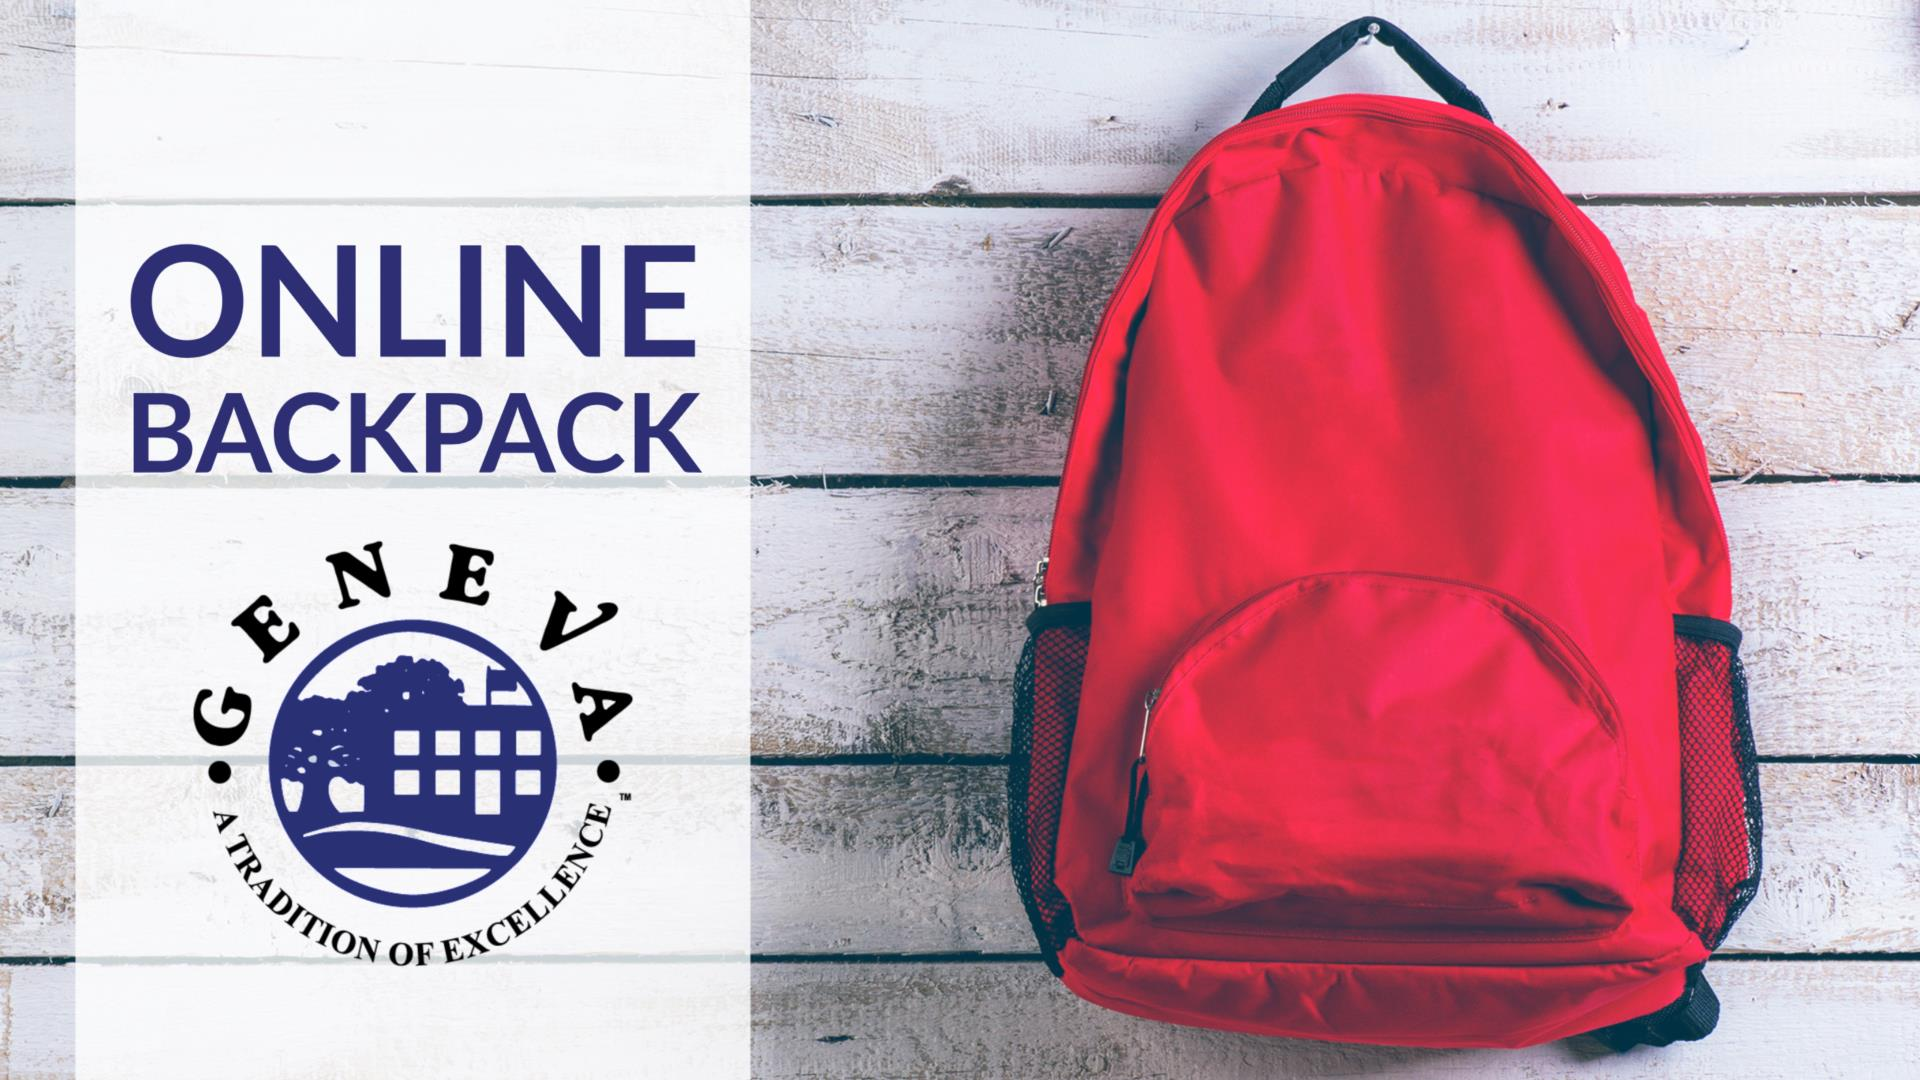 Geneva CUSD 304 Online Backpack